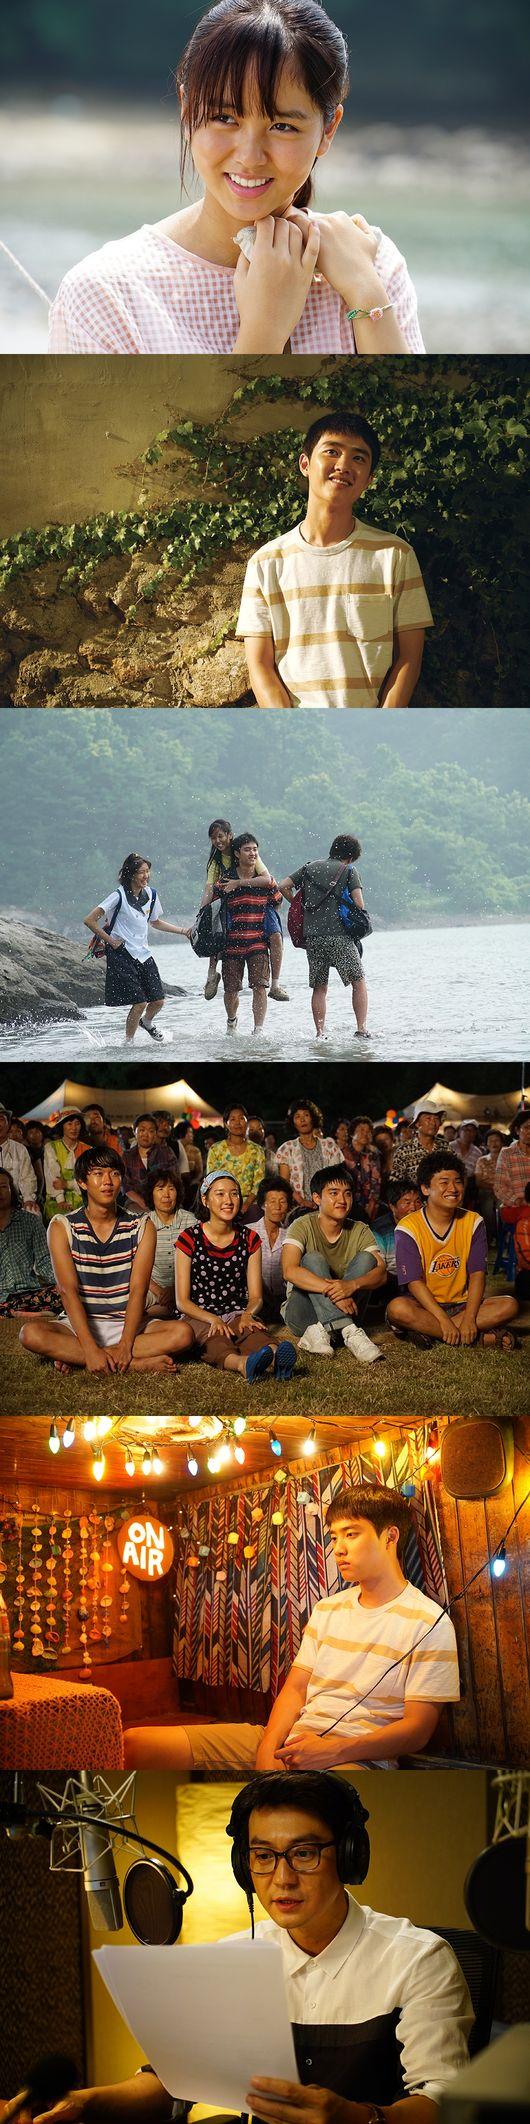 D.O-kim so hyun-movie stills